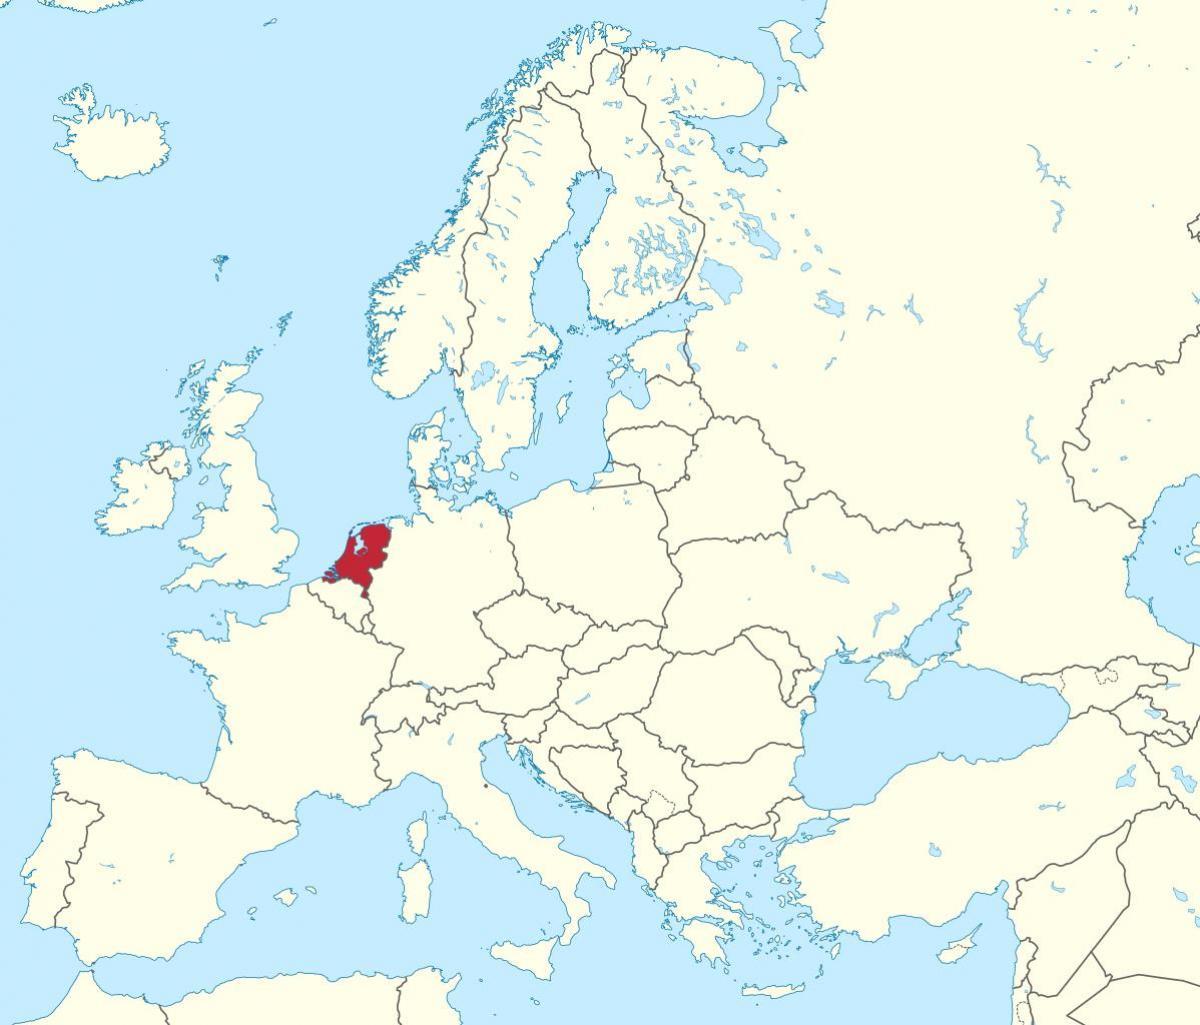 mapa europa holanda Holanda, Europa mapa   Mapa de Europa Holanda (Europa Occidental  mapa europa holanda